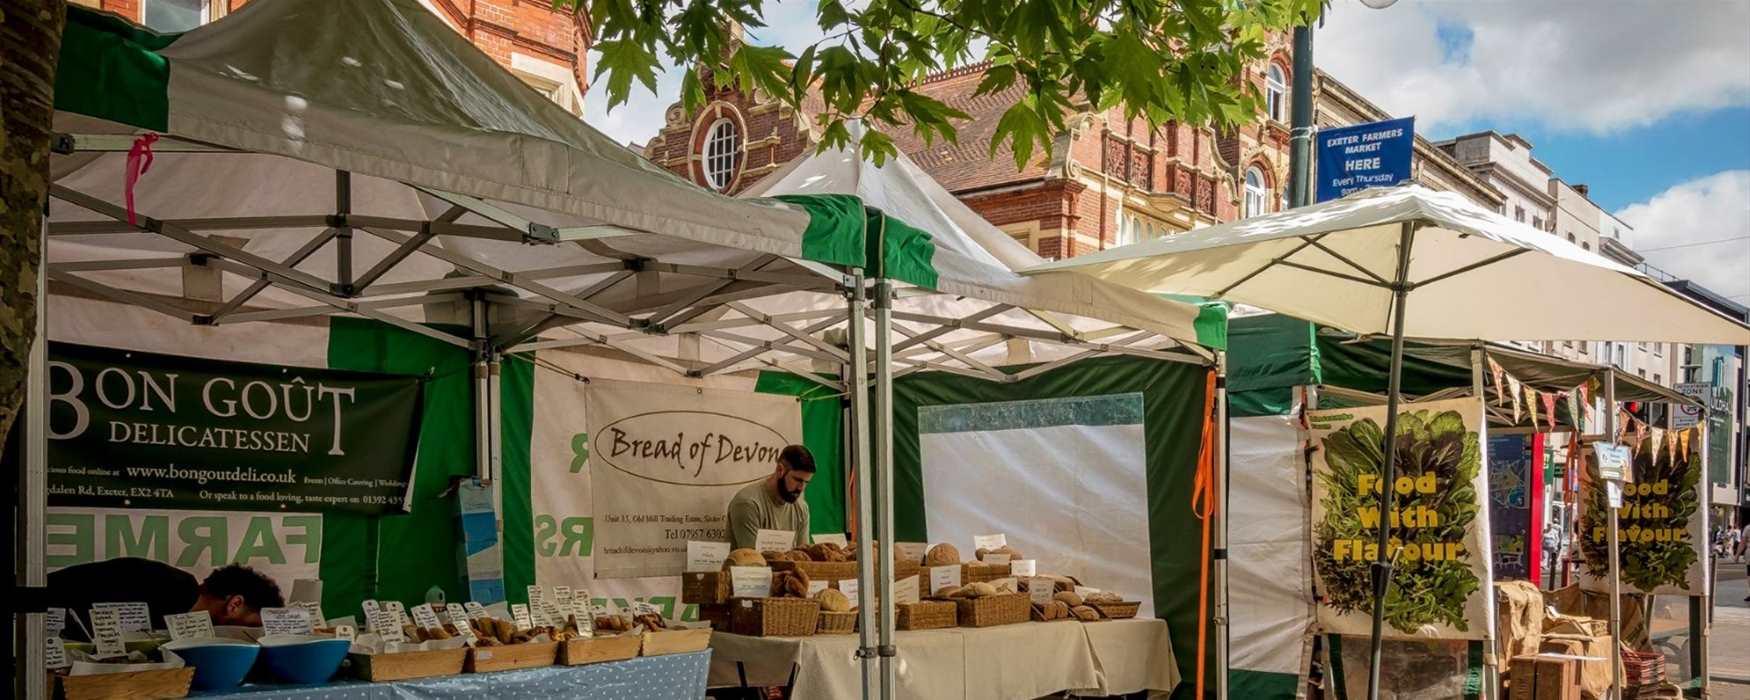 Exeter Farmers Market (c) Jan Penny